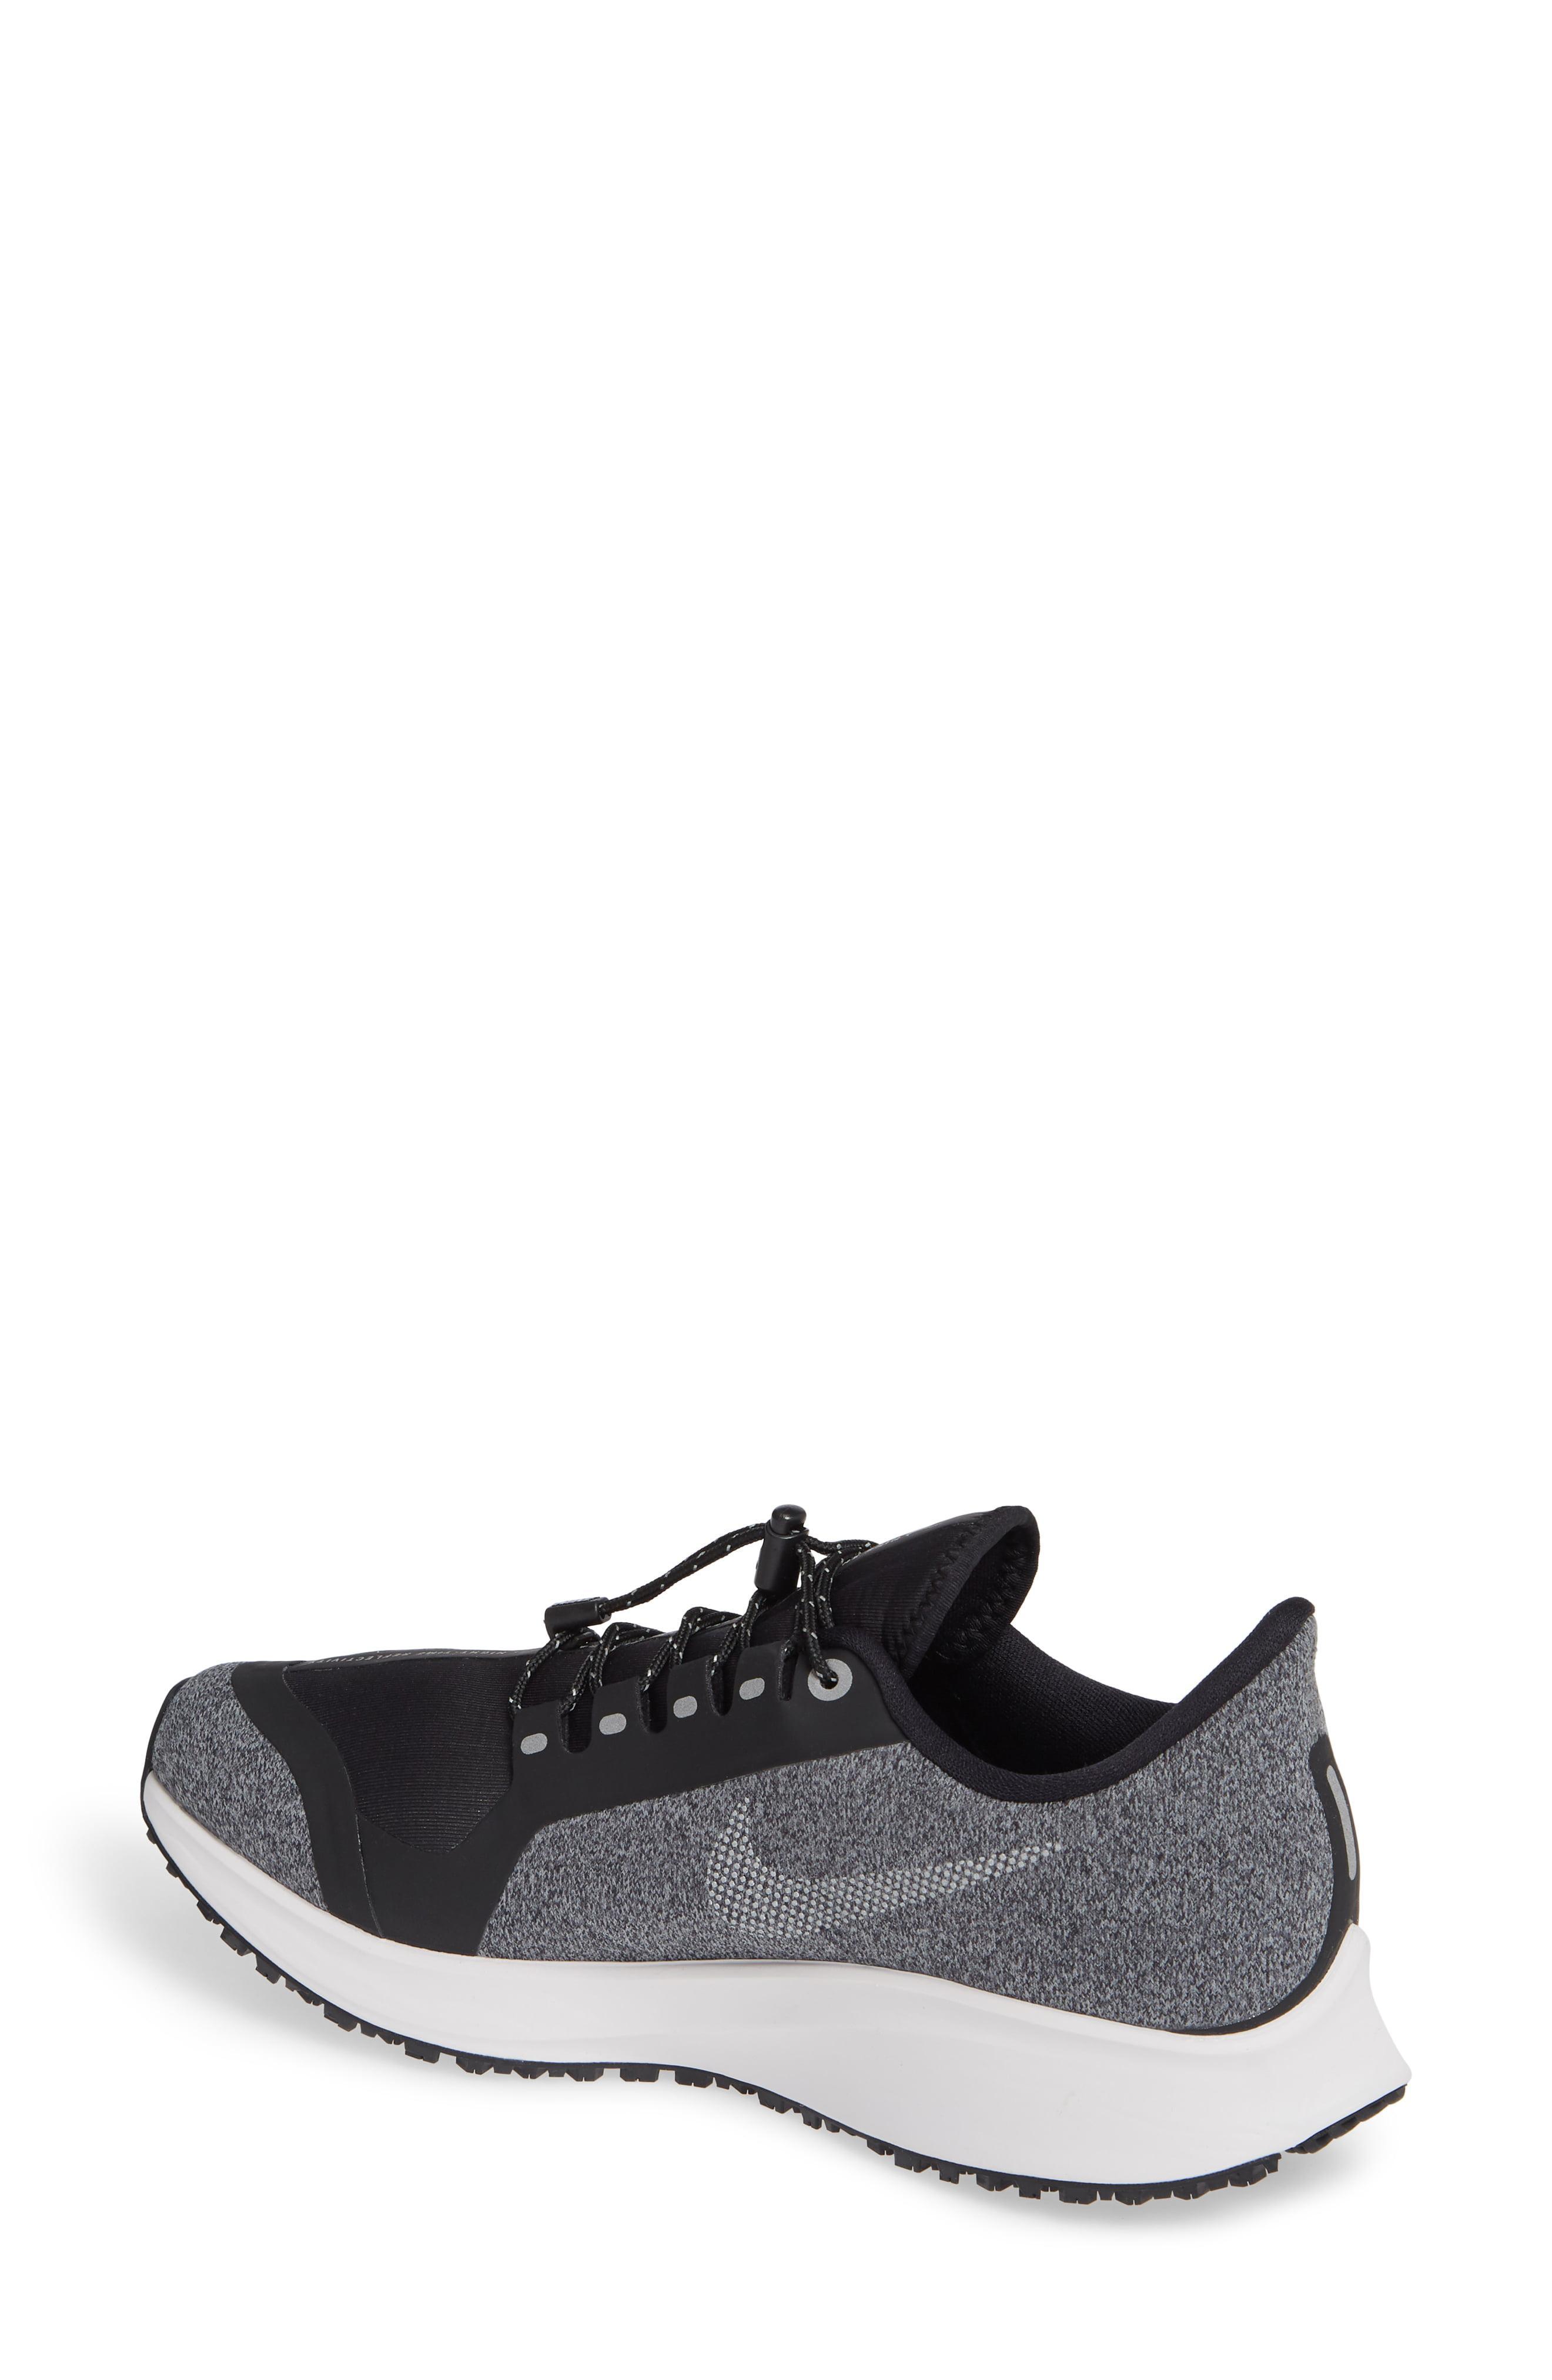 54a7637e3faad Nike - Gray Air Zoom Pegasus 35 Shield Gs Water Repellent Running Shoe -  Lyst. View fullscreen